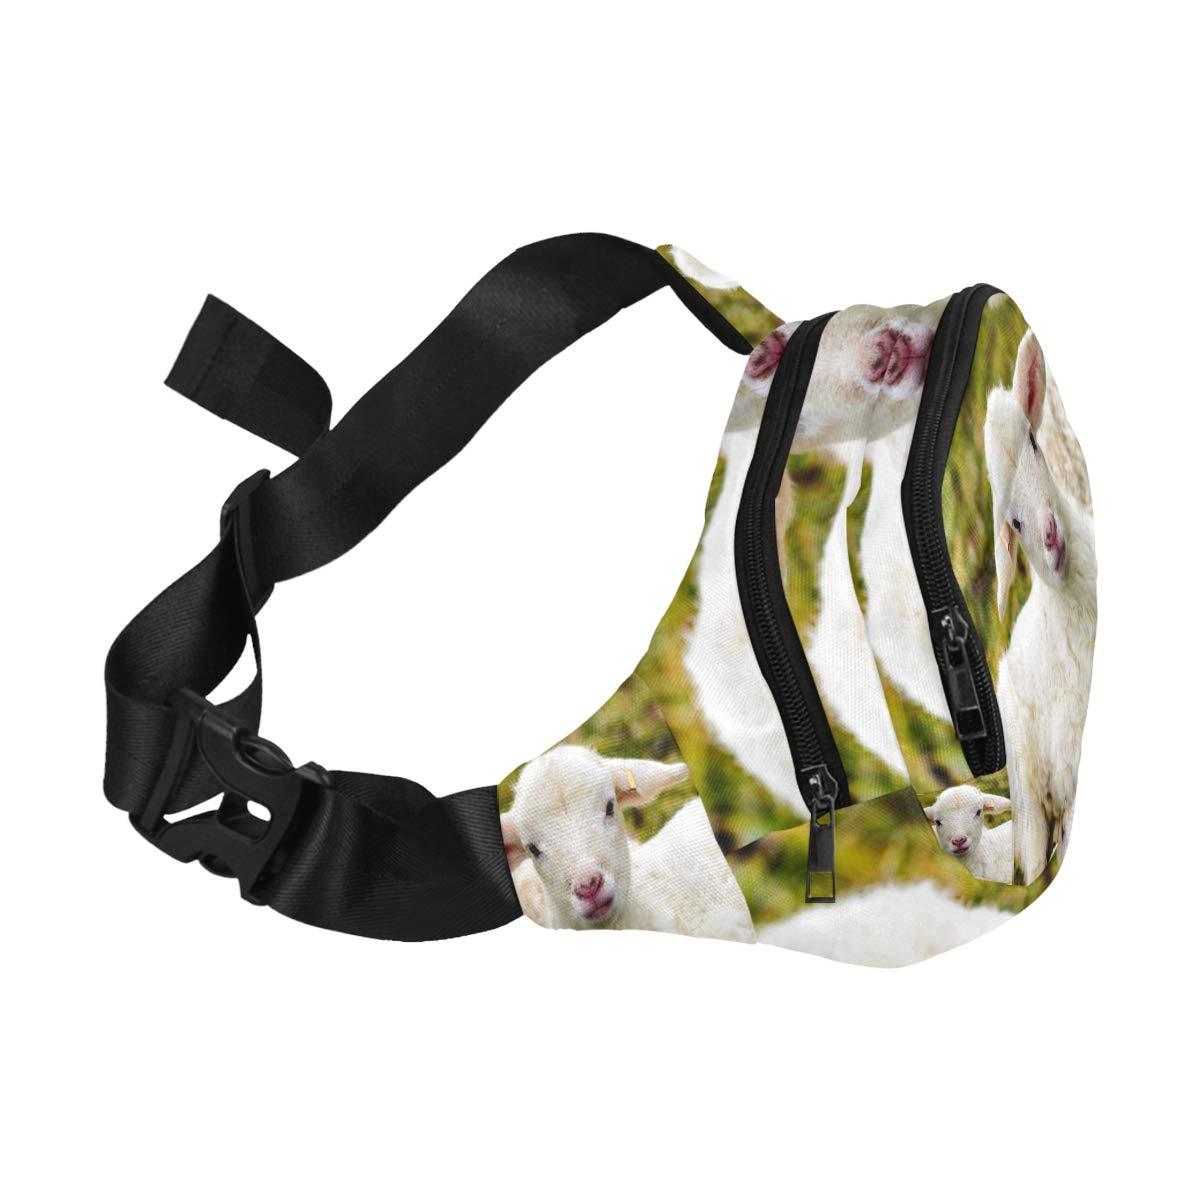 One Sheep In Meadow With November Sun Fenny Packs Waist Bags Adjustable Belt Waterproof Nylon Travel Running Sport Vacation Party For Men Women Boys Girls Kids